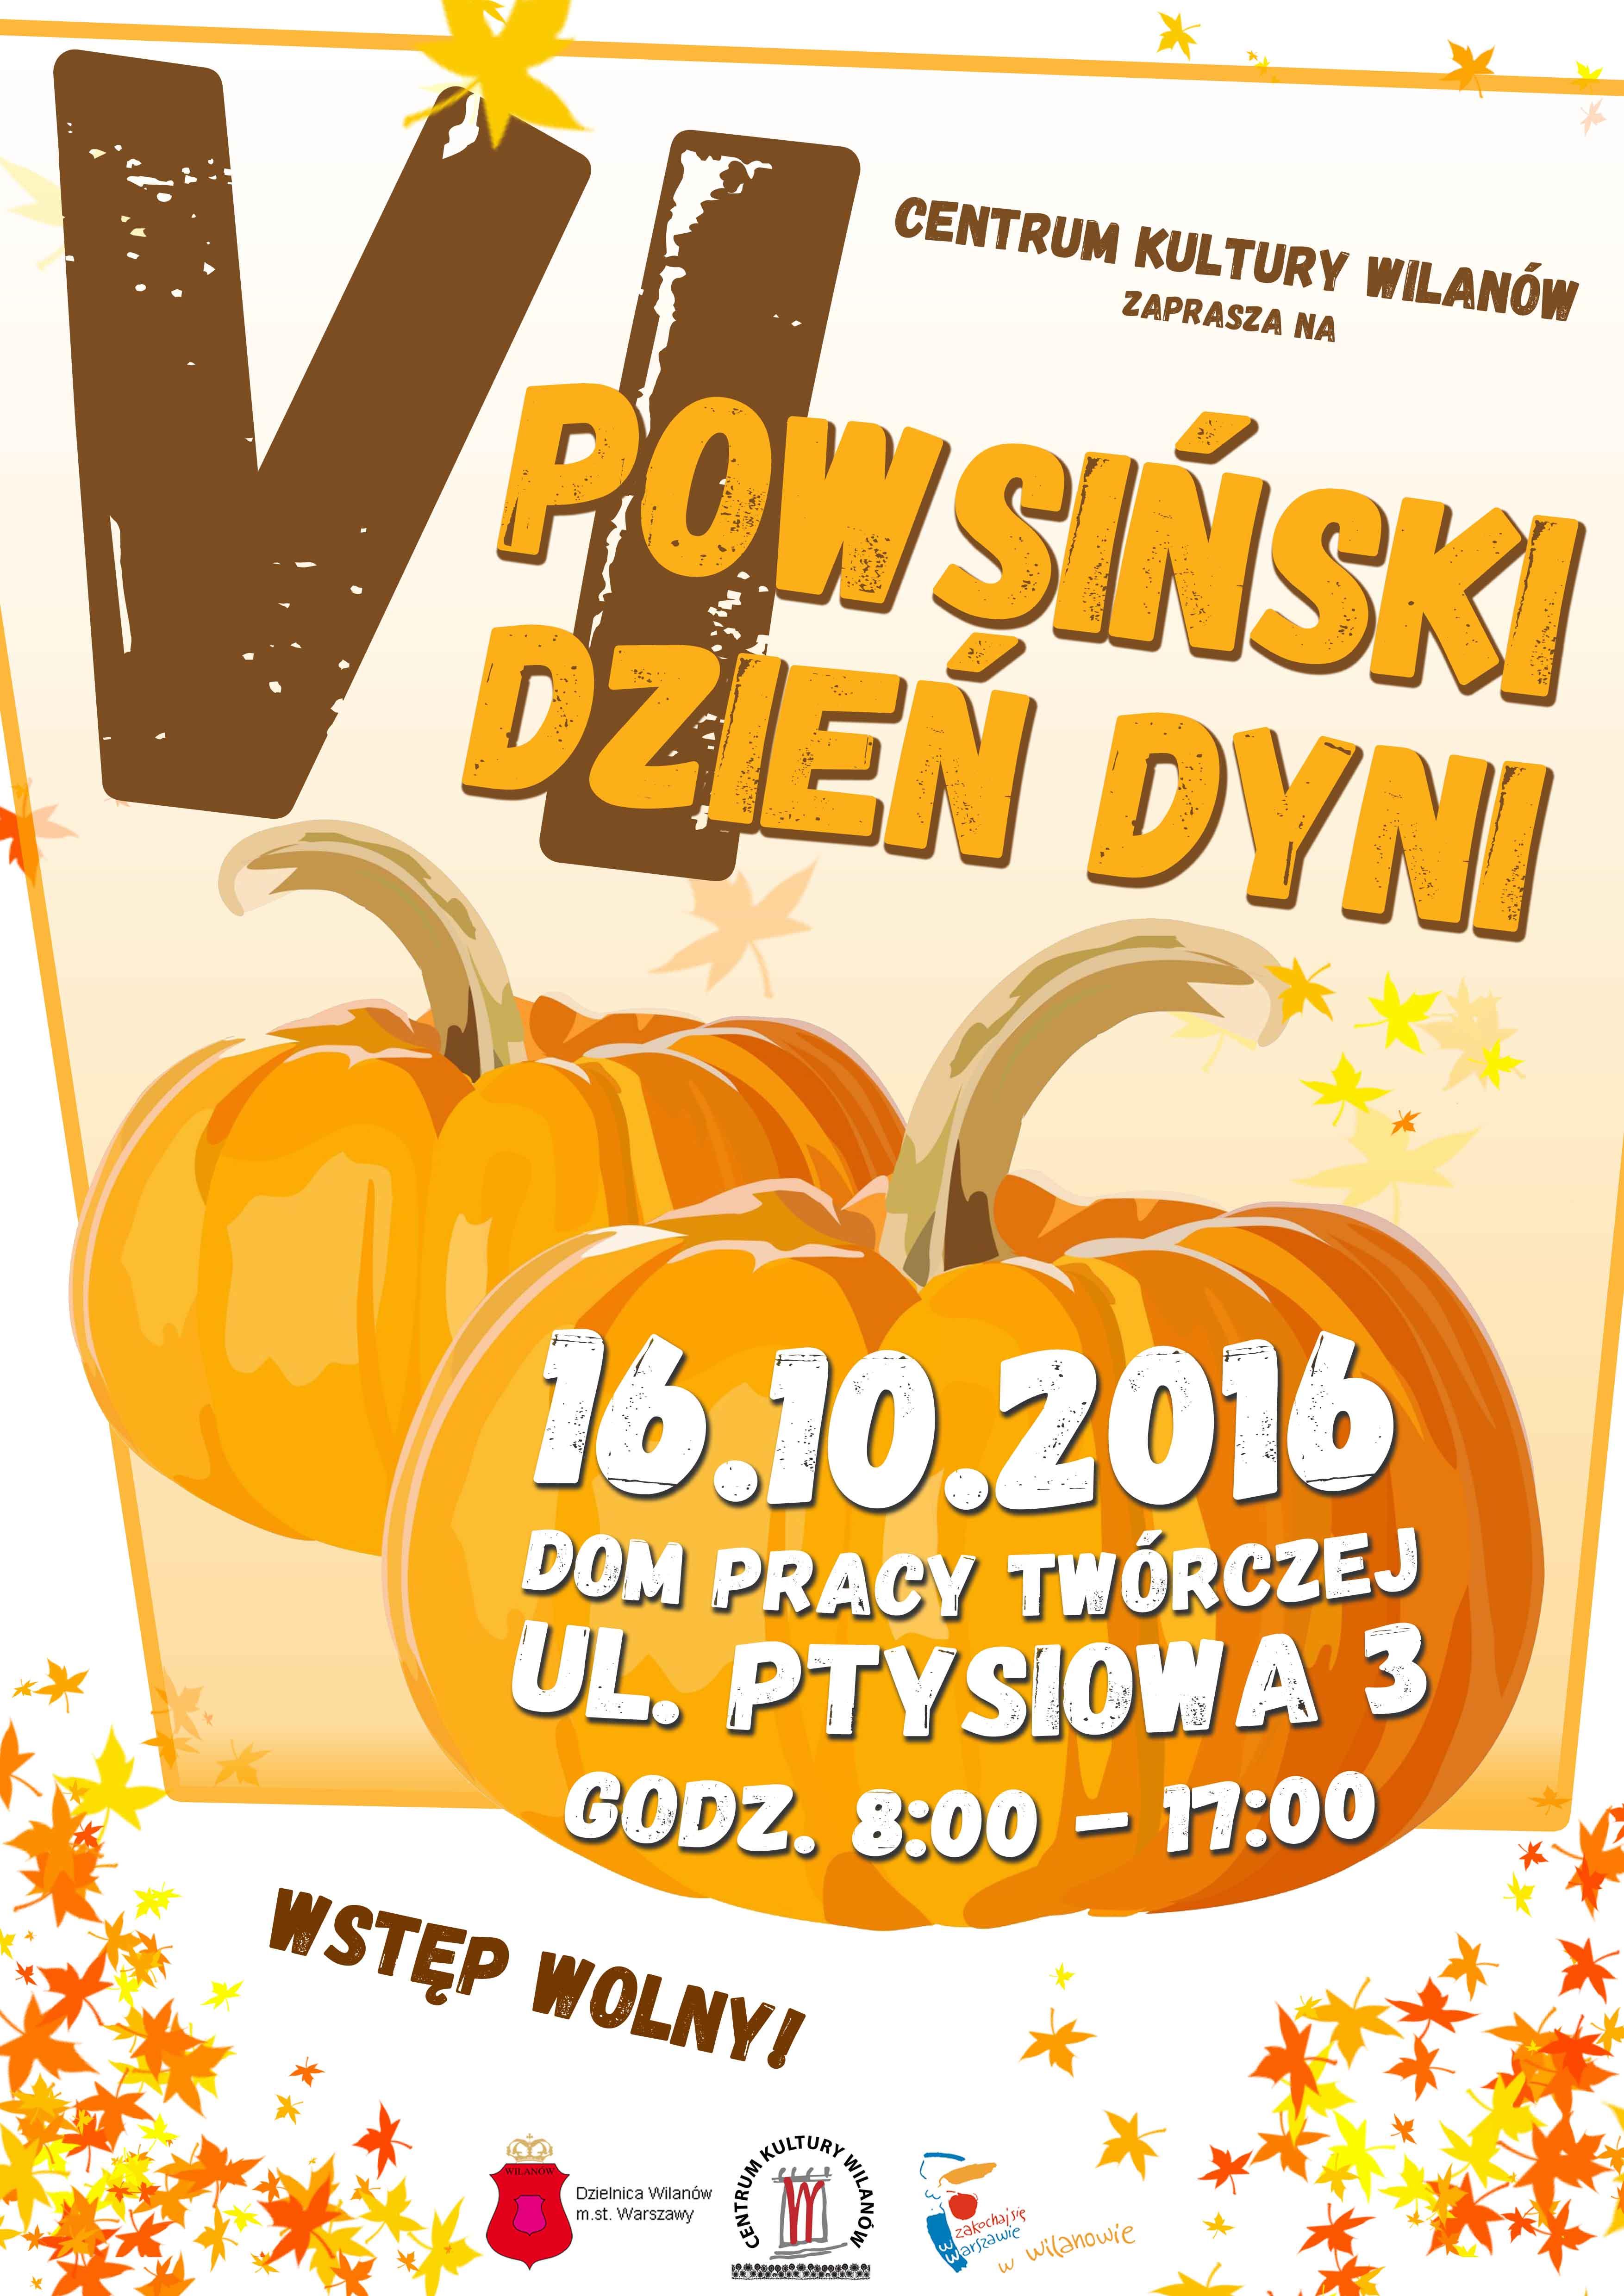 powsinski_dzien_dyni_2016